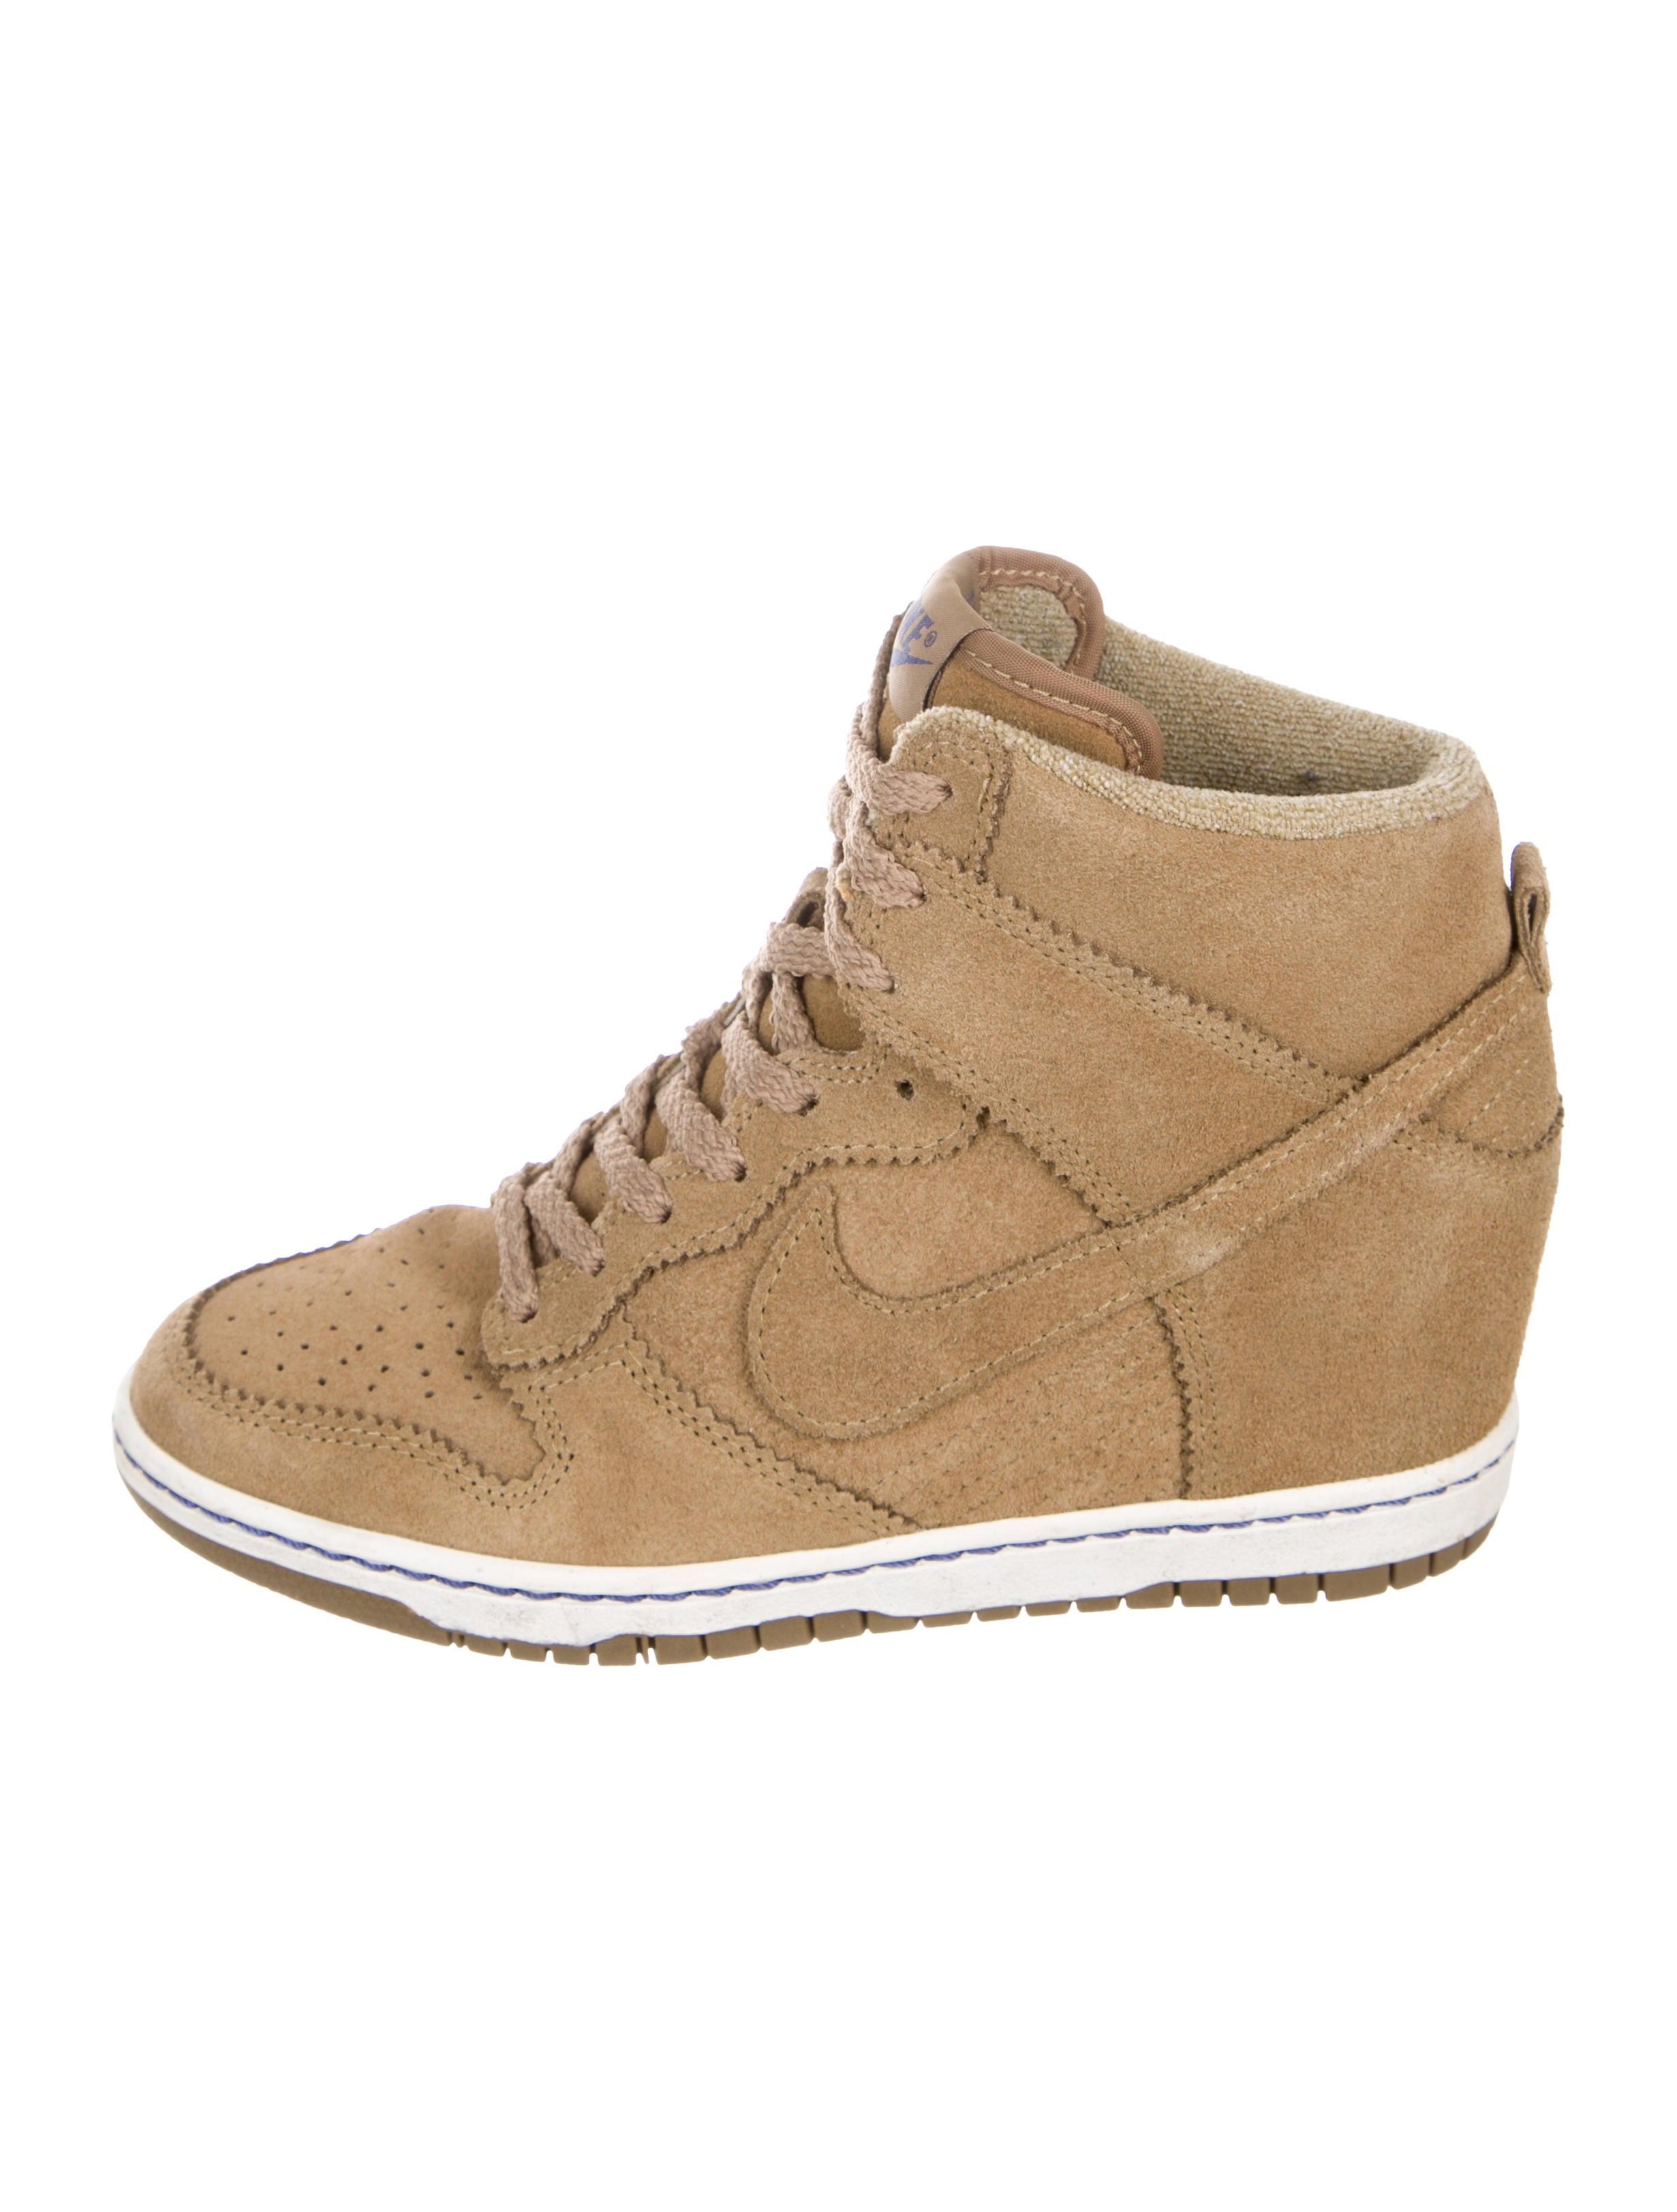 Nike Dunk Sky Hi Sneakers - Shoes - WU230413  bfb3beb3b4